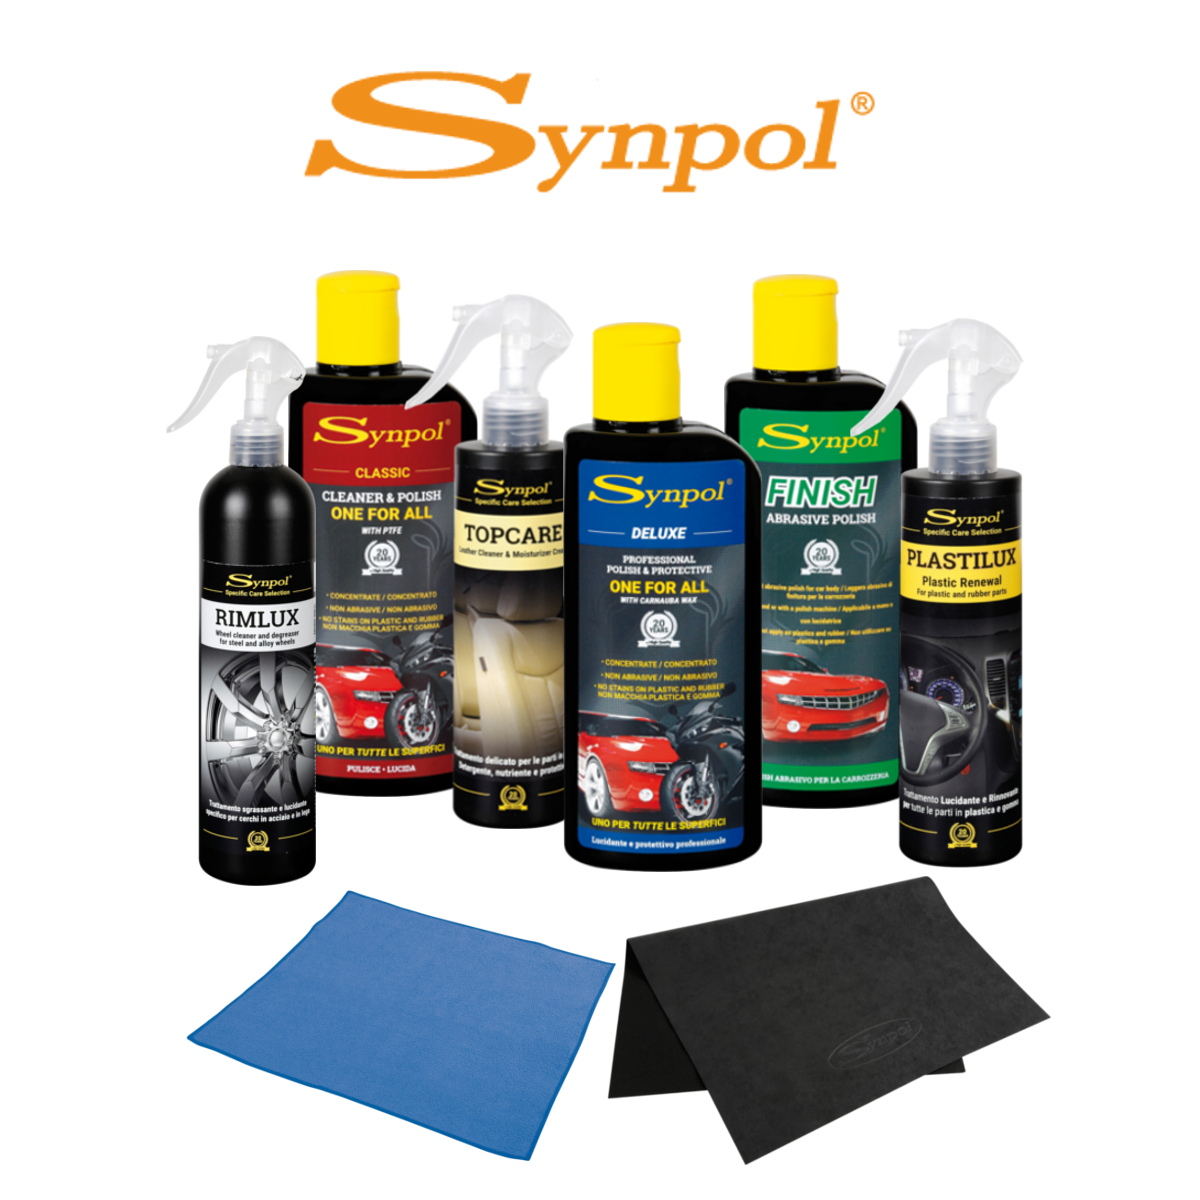 Prodotti linea Synpol